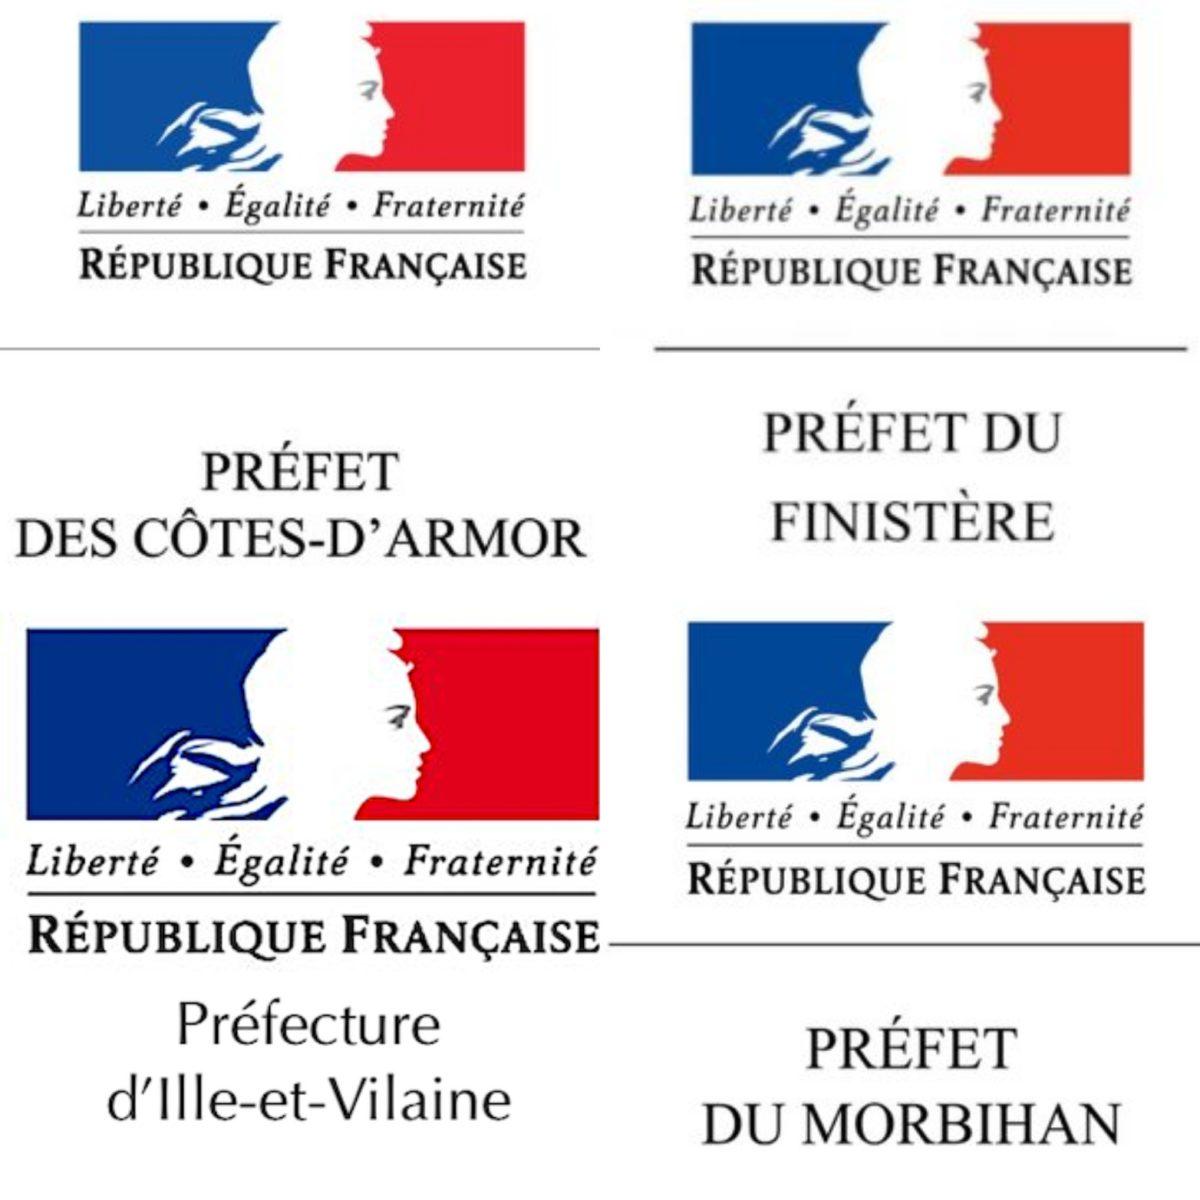 https://www.ligue-bretagne-surf.bzh/wp-content/uploads/2020/05/IMG_20200510_145933-1200x1200.jpg